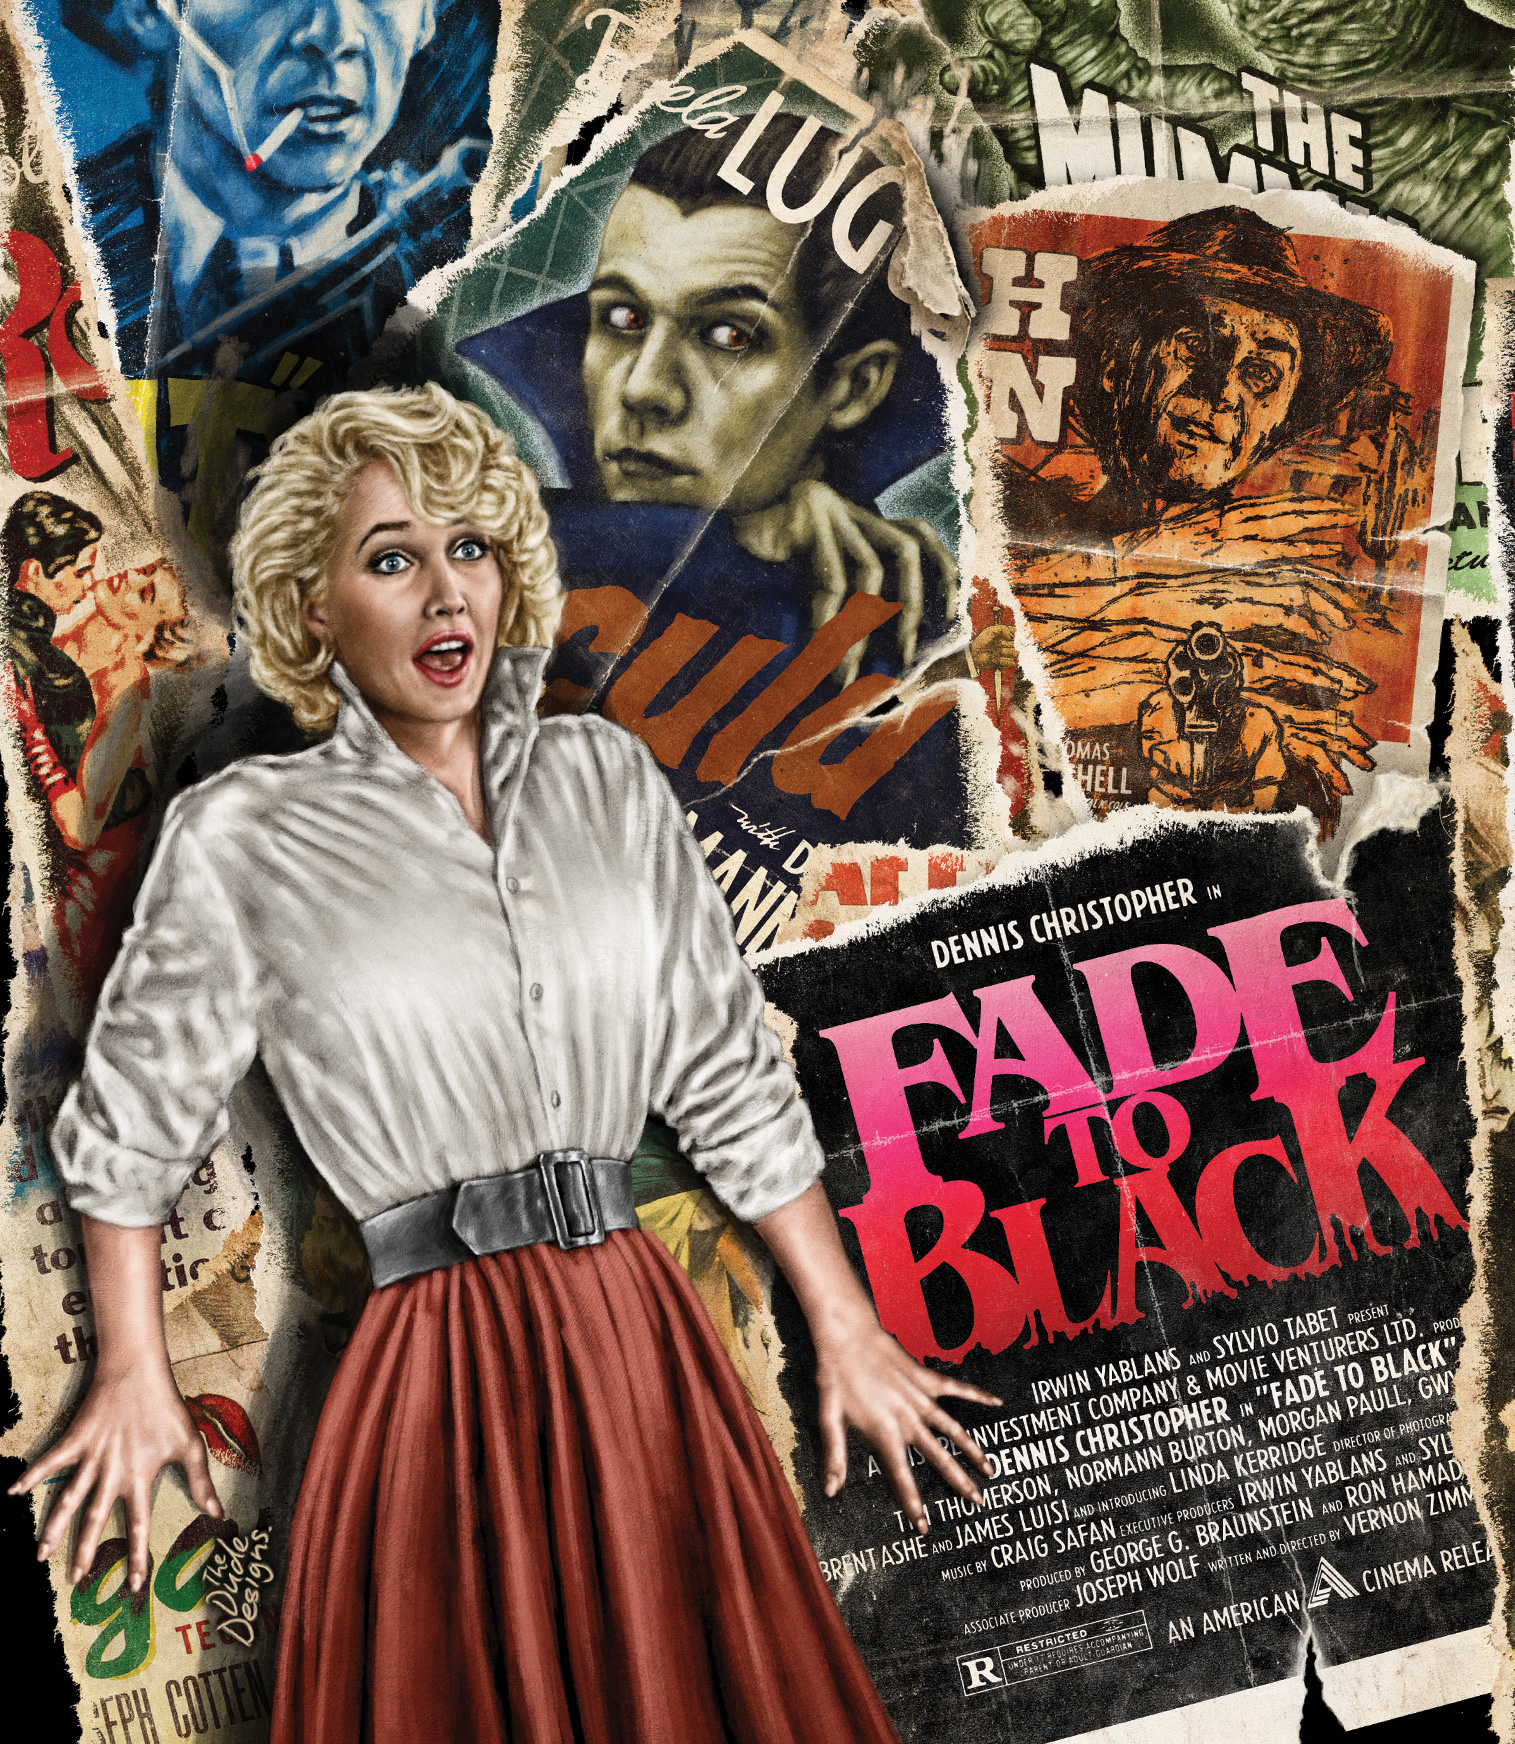 Fade to black image film